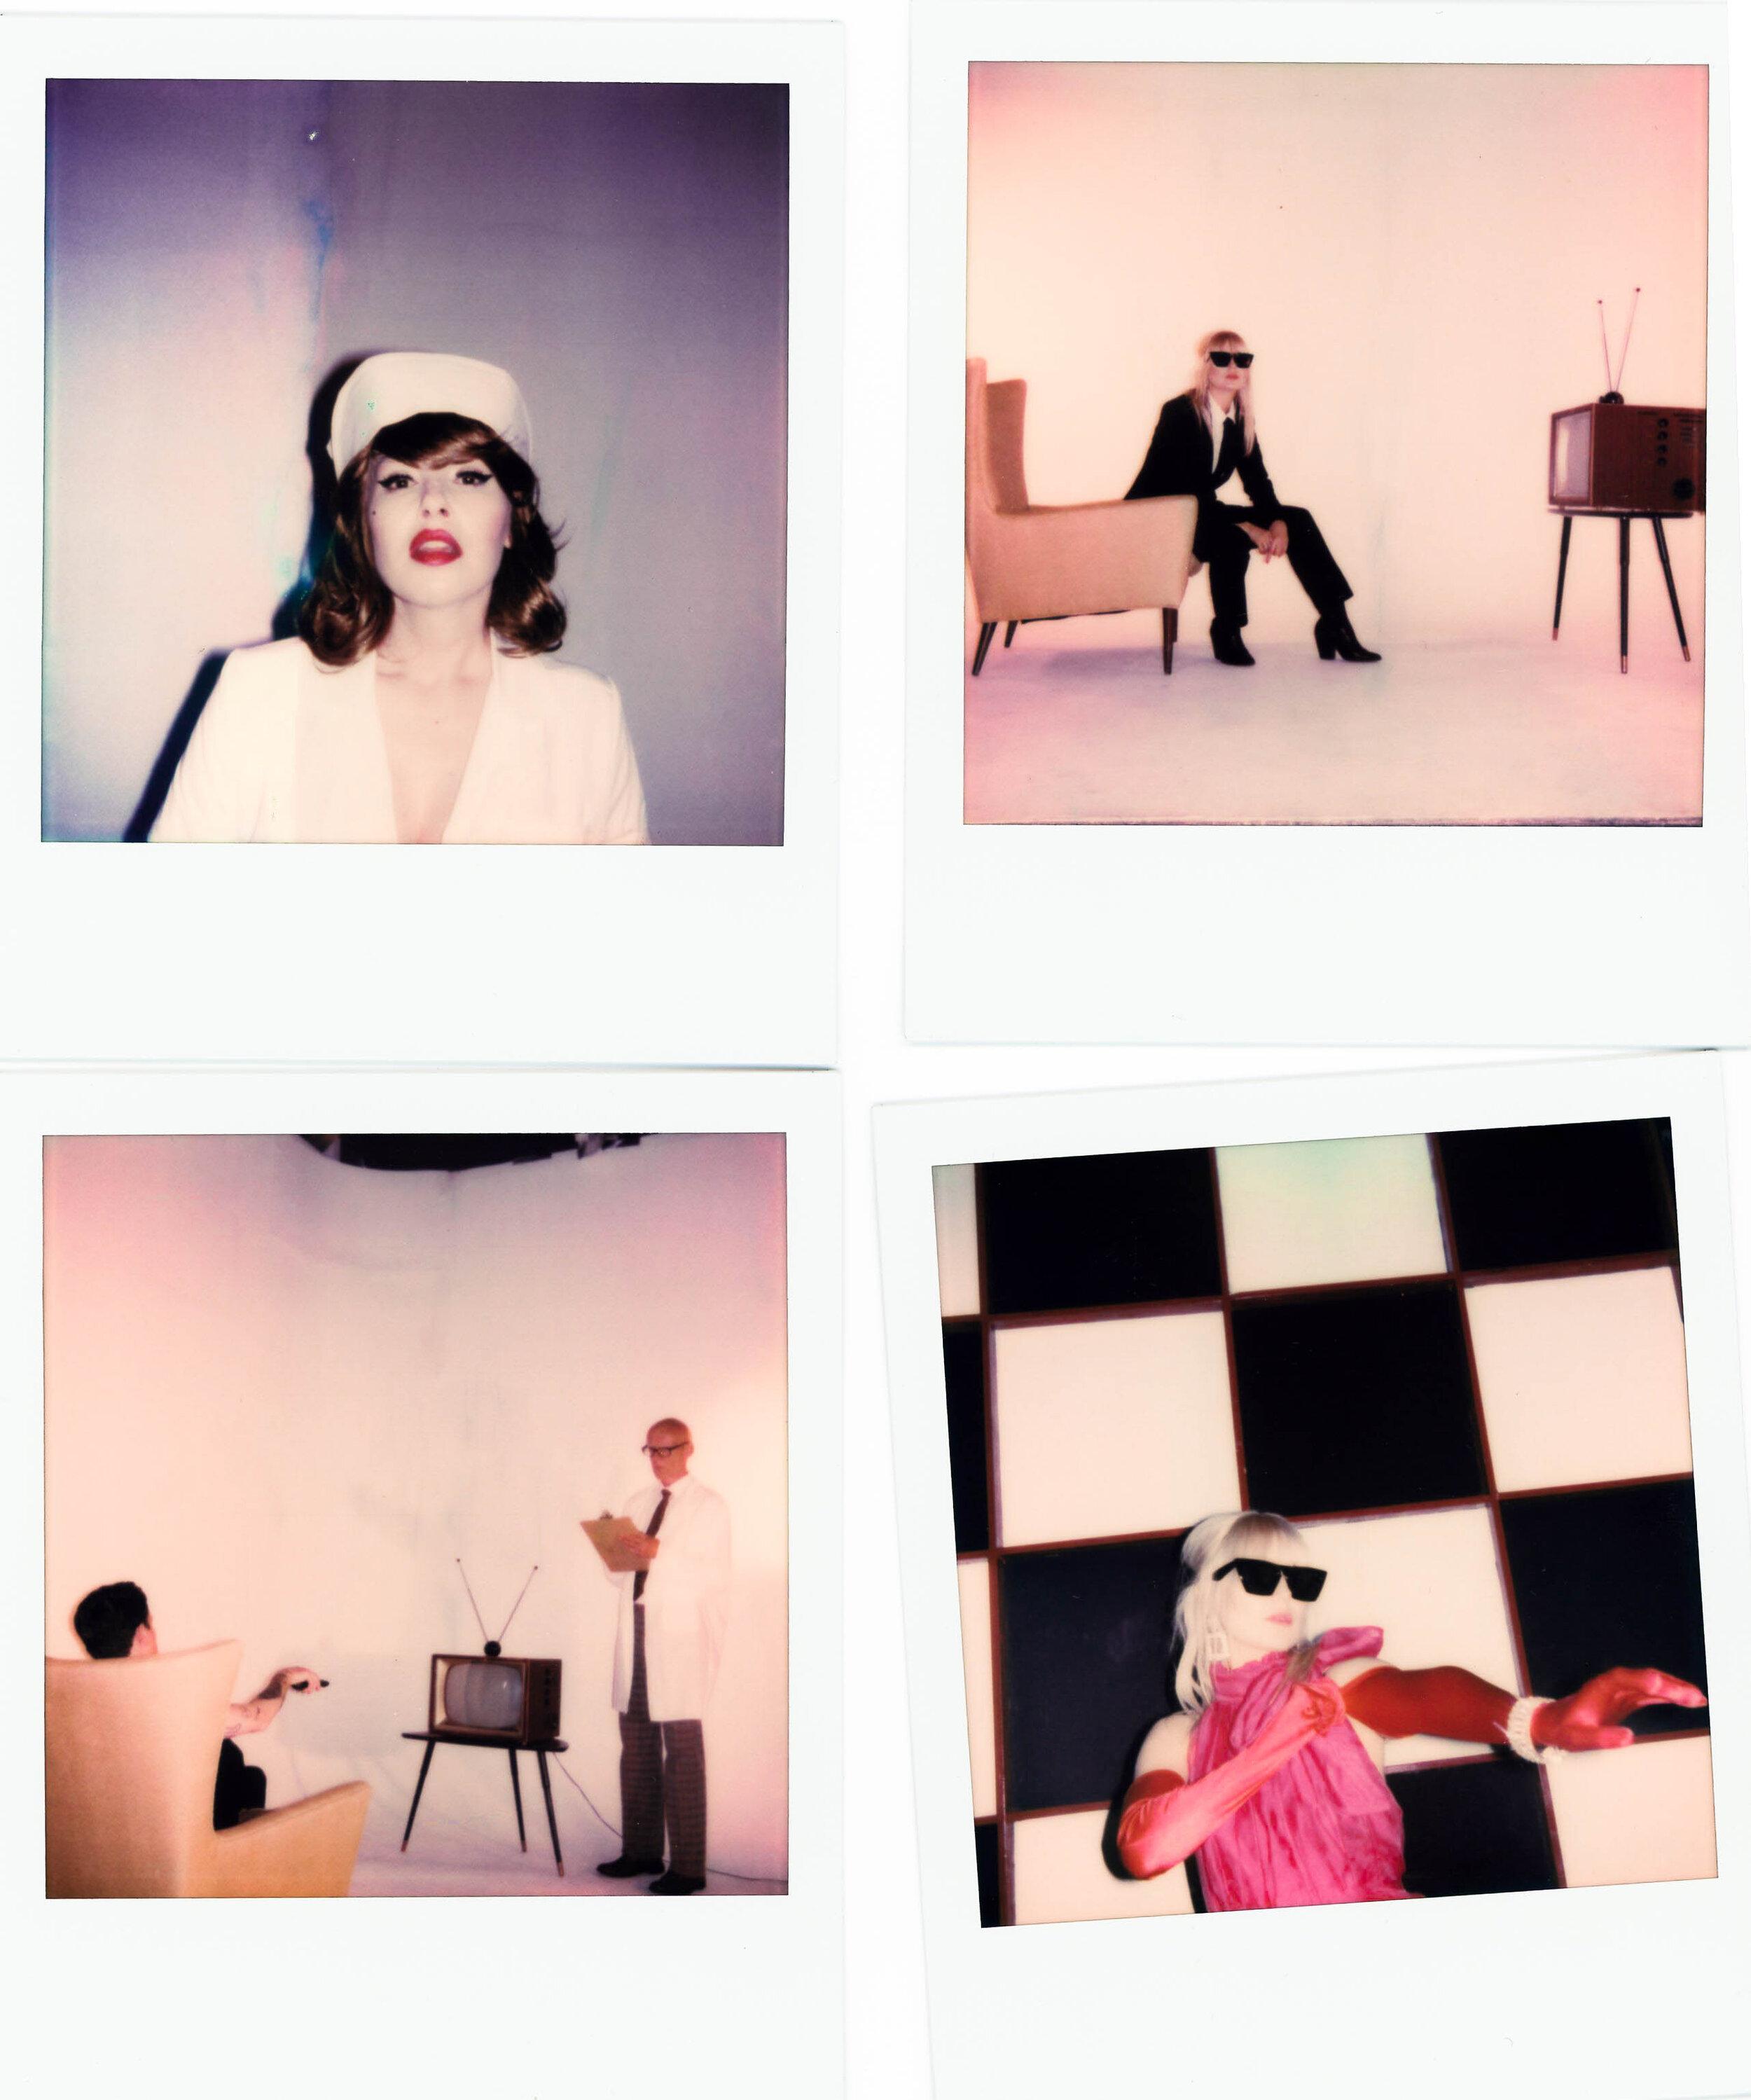 Polaroids by Ryan Rosewall.